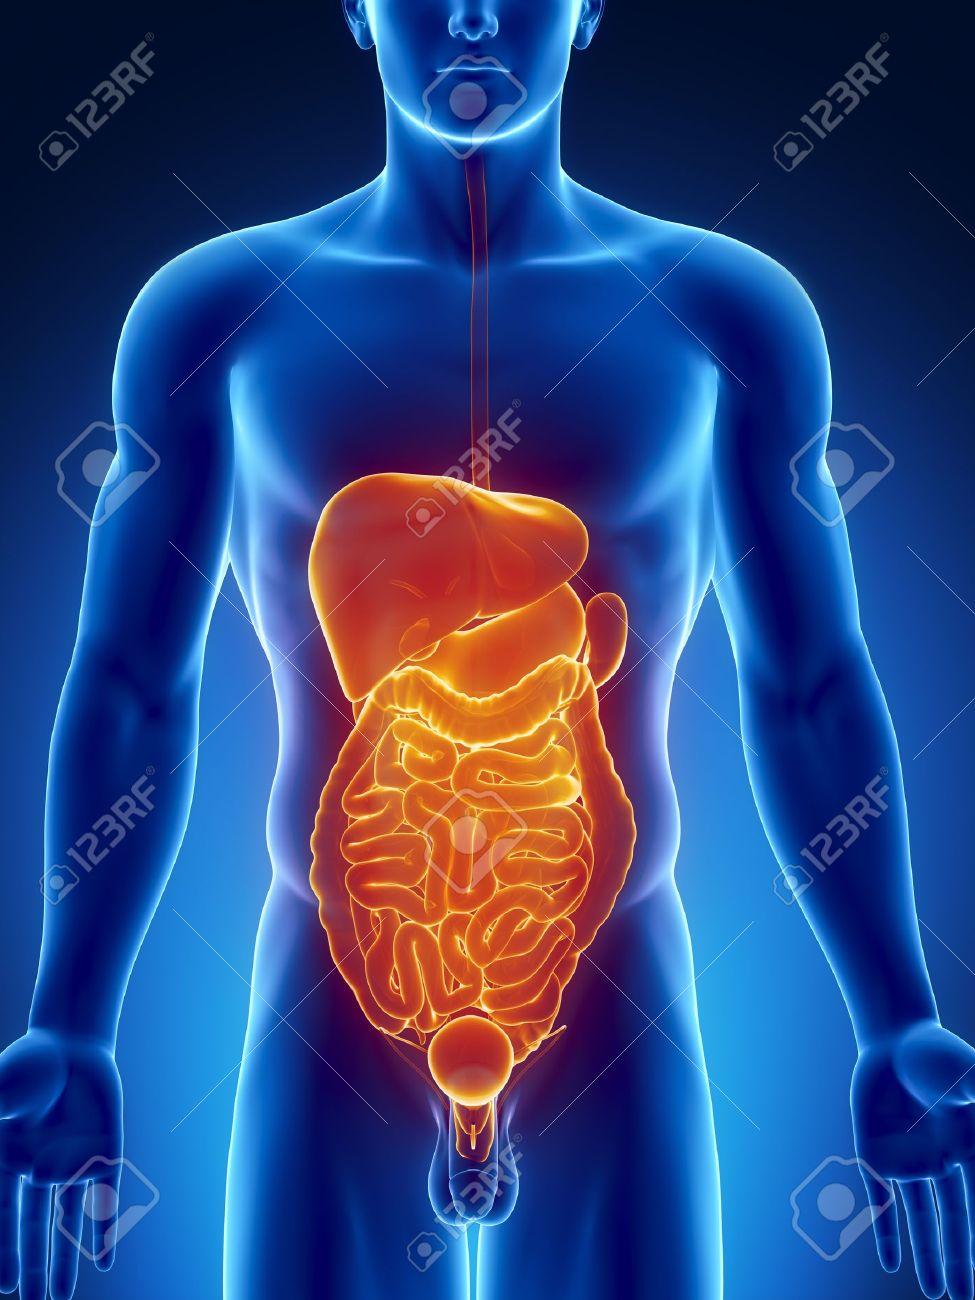 Male Anatomy Of Human Abdominal Organs In Blue Orange X Ray View